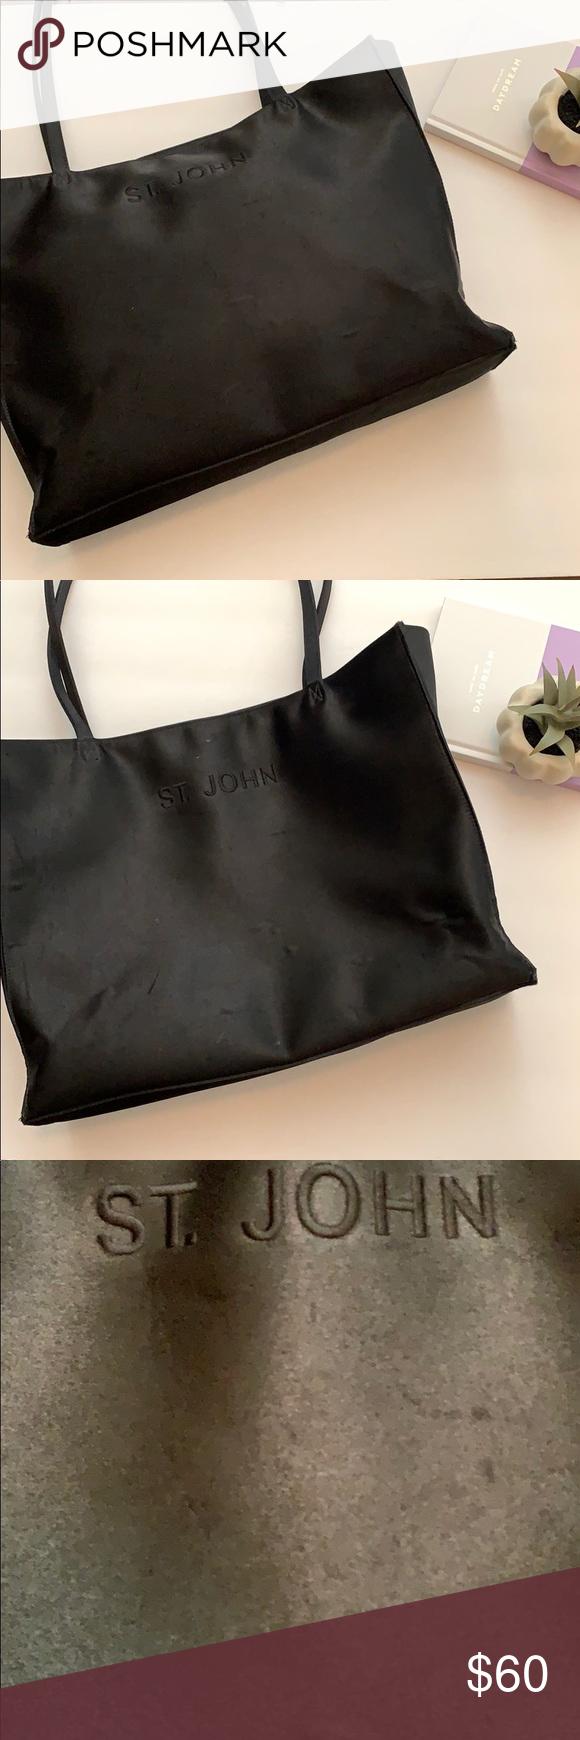 Vintage St John Tote Bag Tote Bag Bags Tote